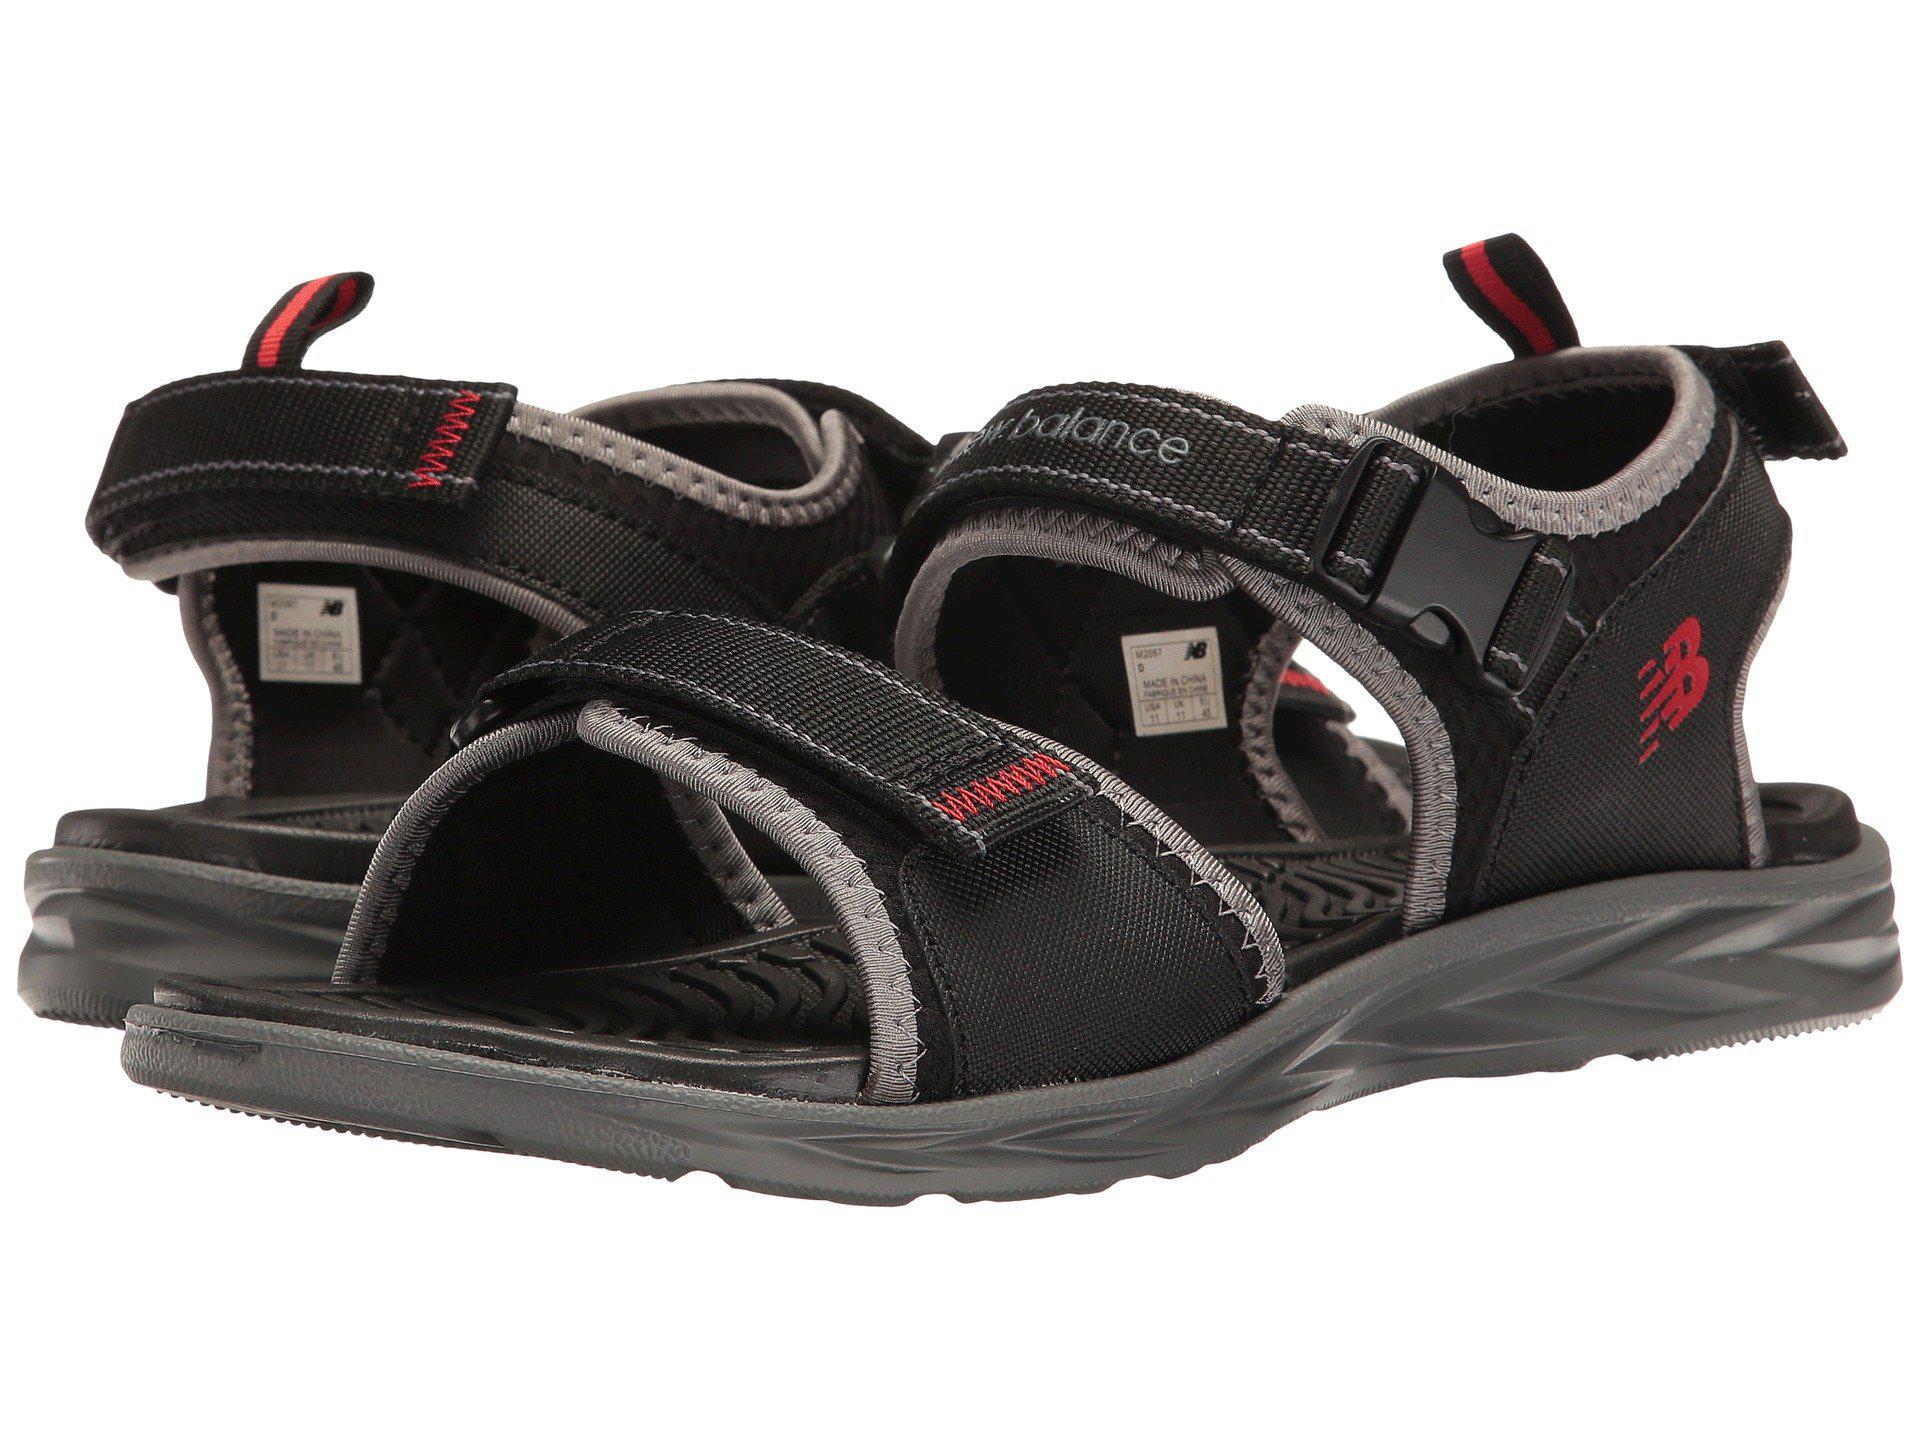 91df276b2525 Lyst - New Balance Response Sandal (brown) Men s Sandals in Black ...